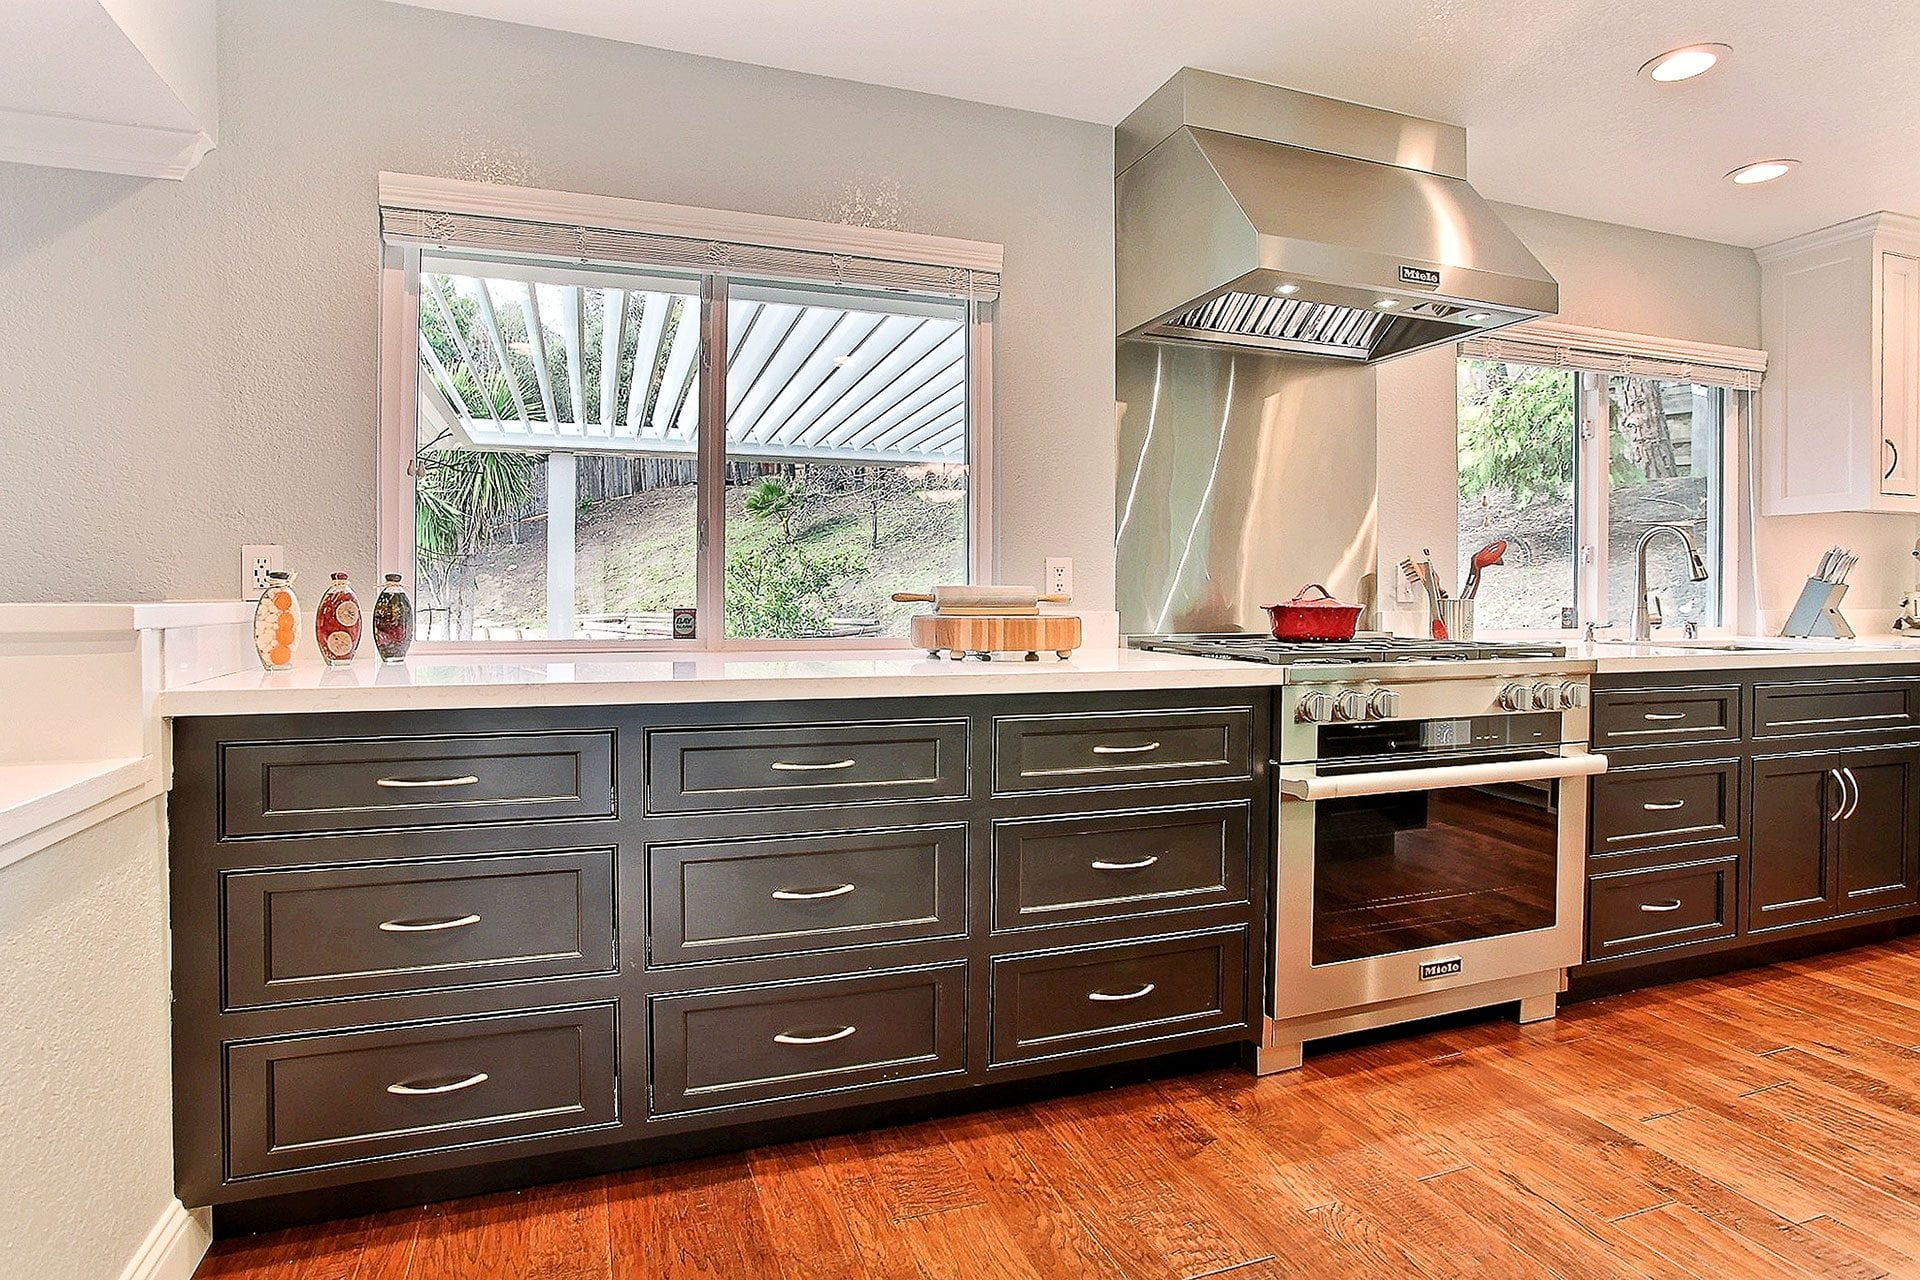 brown kitchen drawers